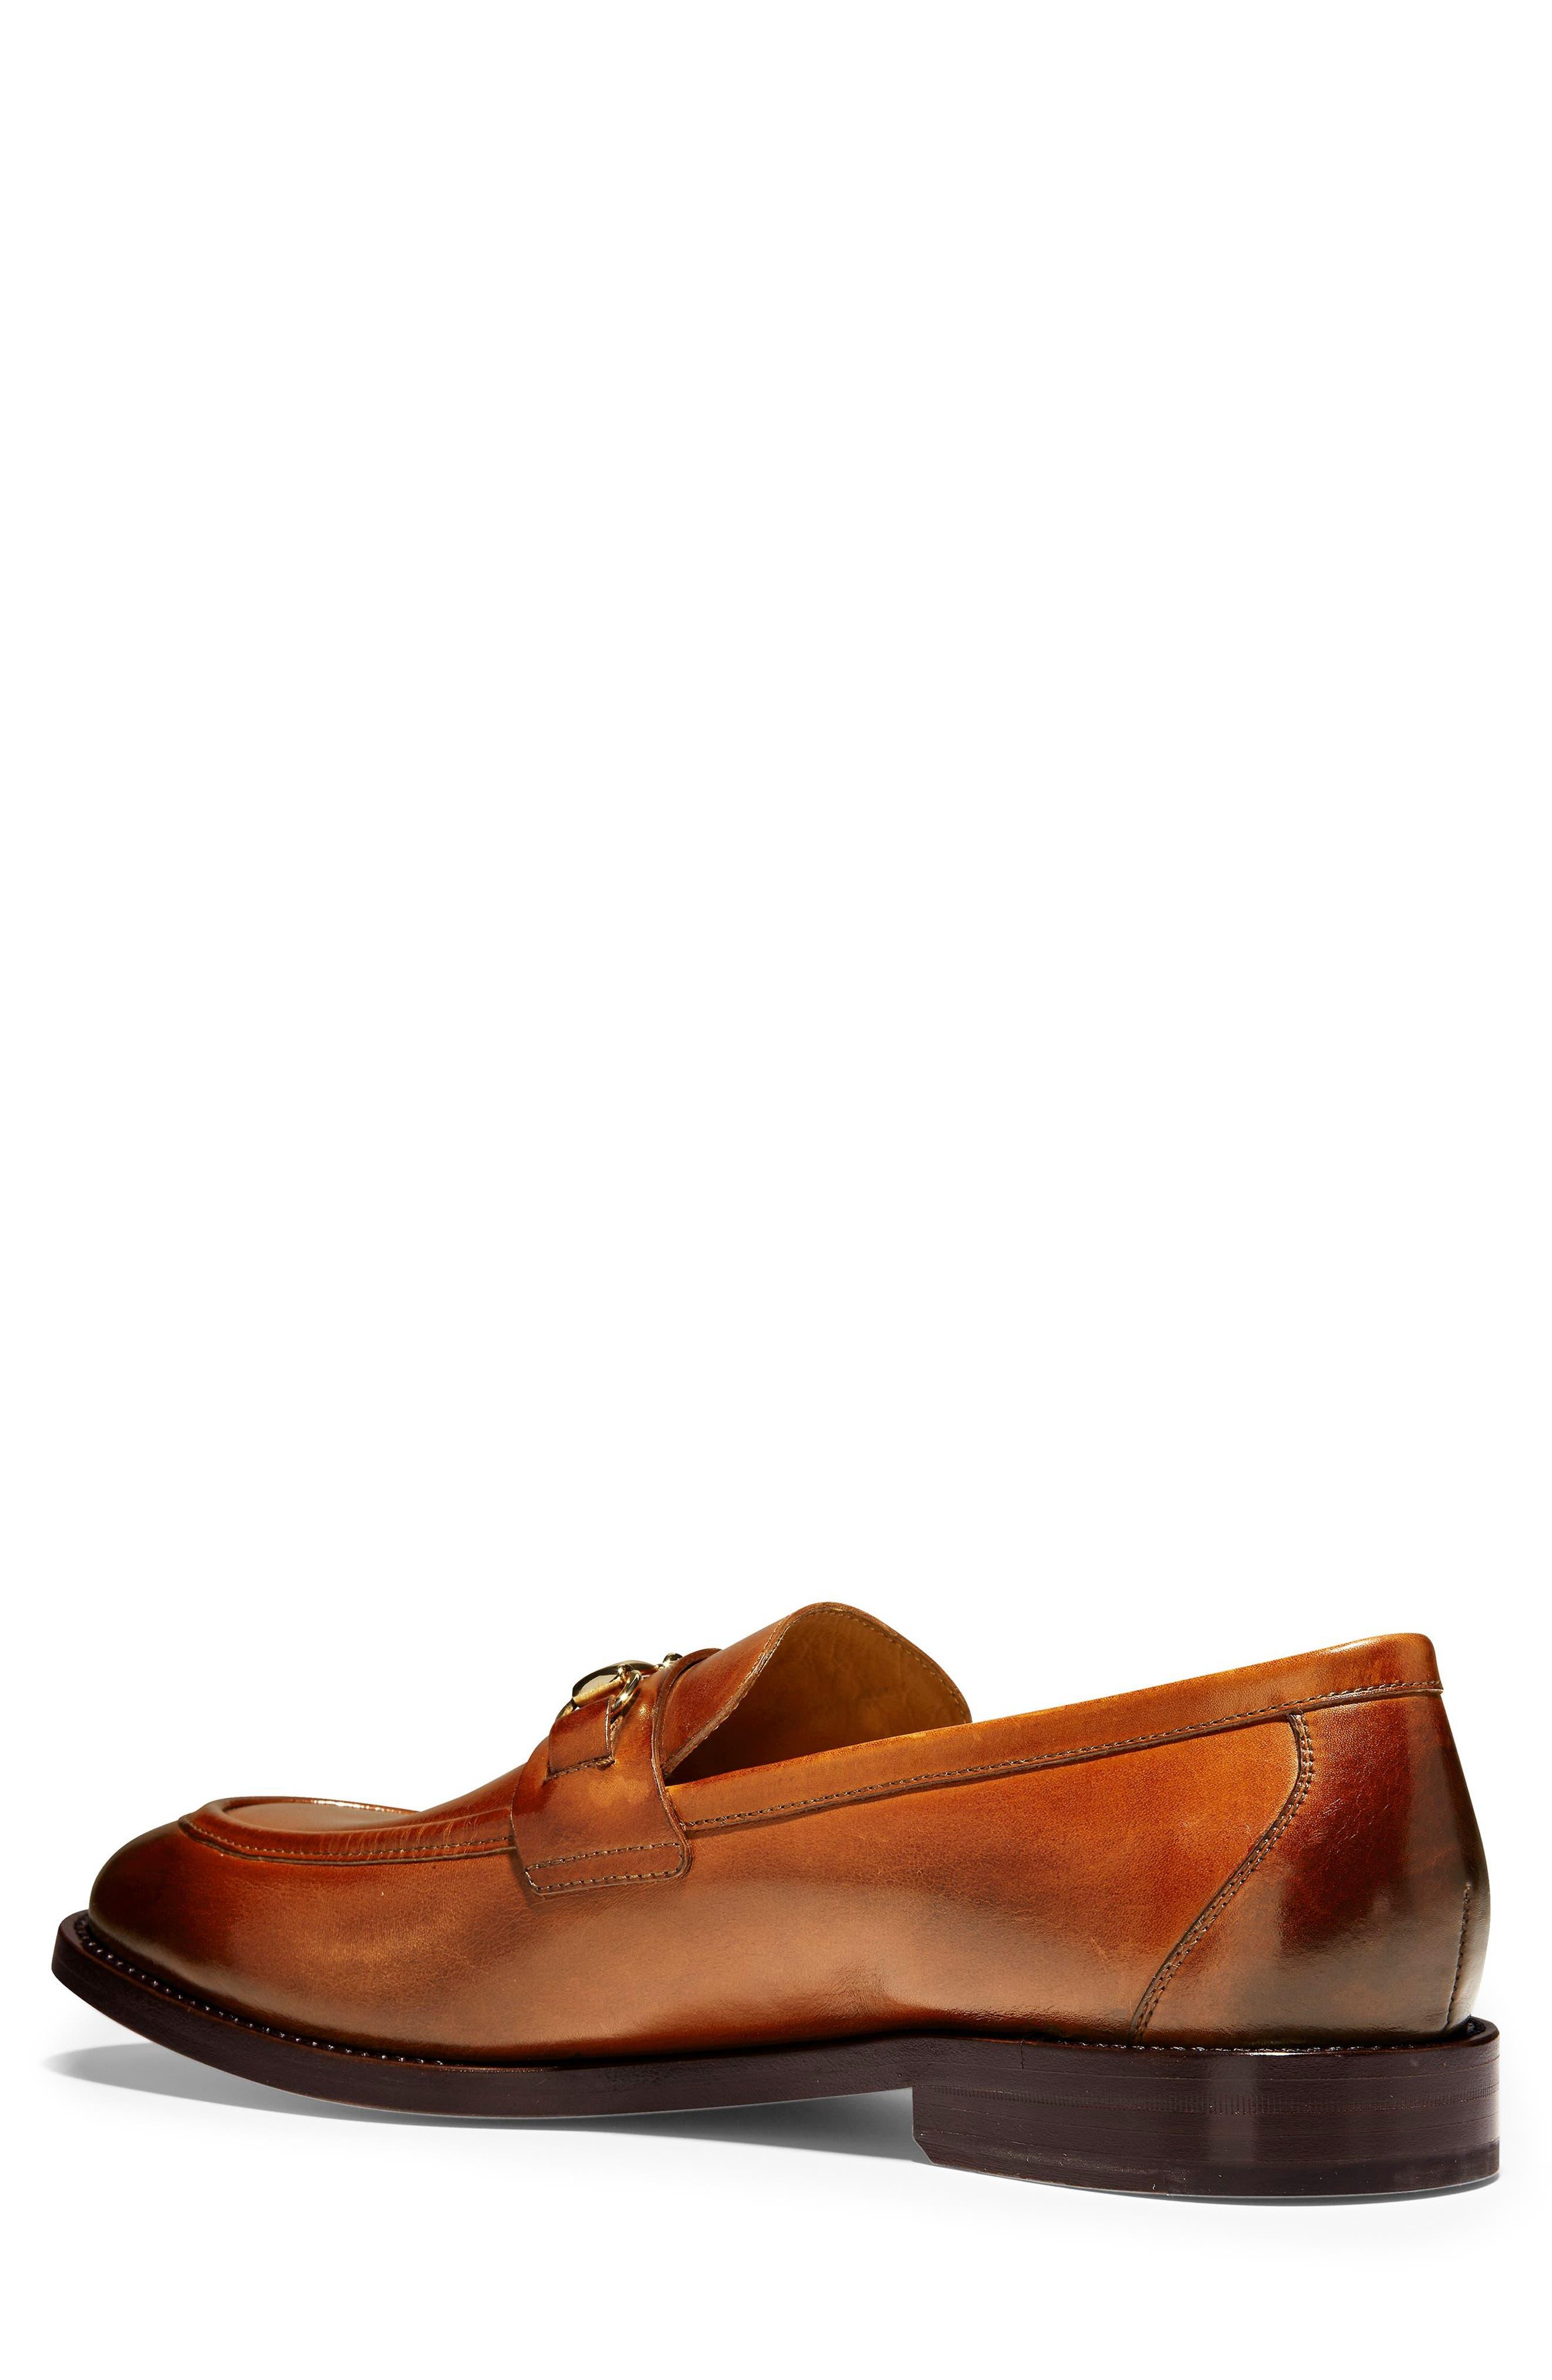 American Classics Kneeland Bit Loafer,                             Alternate thumbnail 2, color,                             BRITISH TAN LEATHER